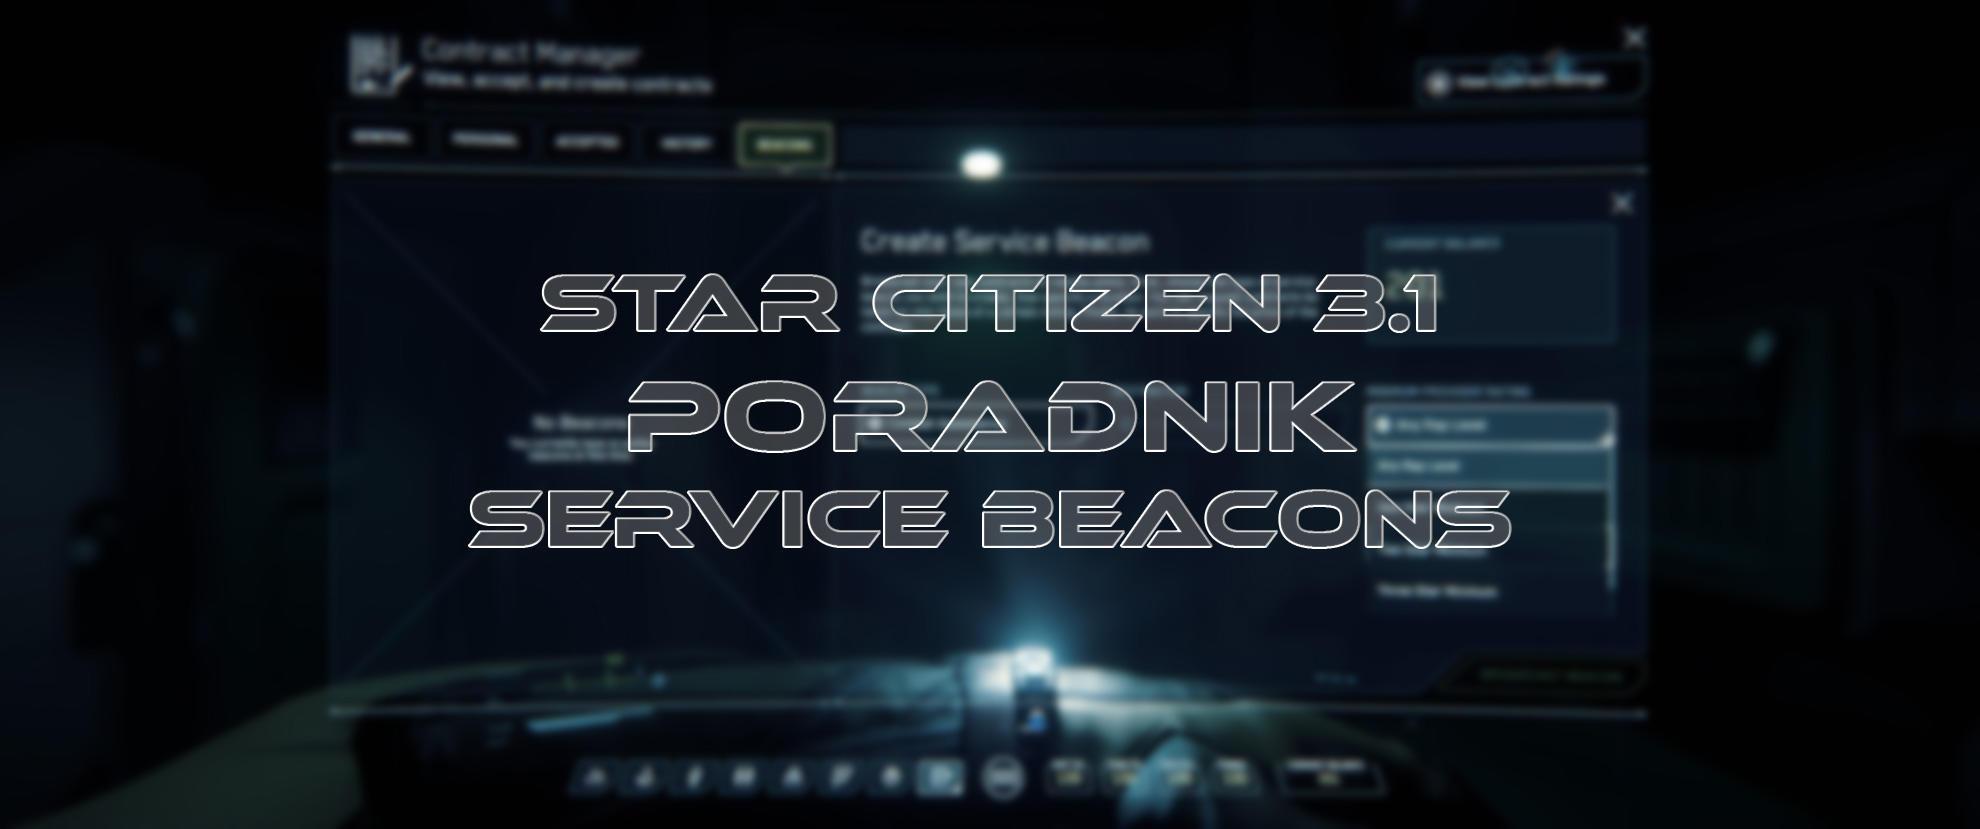 Service Beacons - poradnik